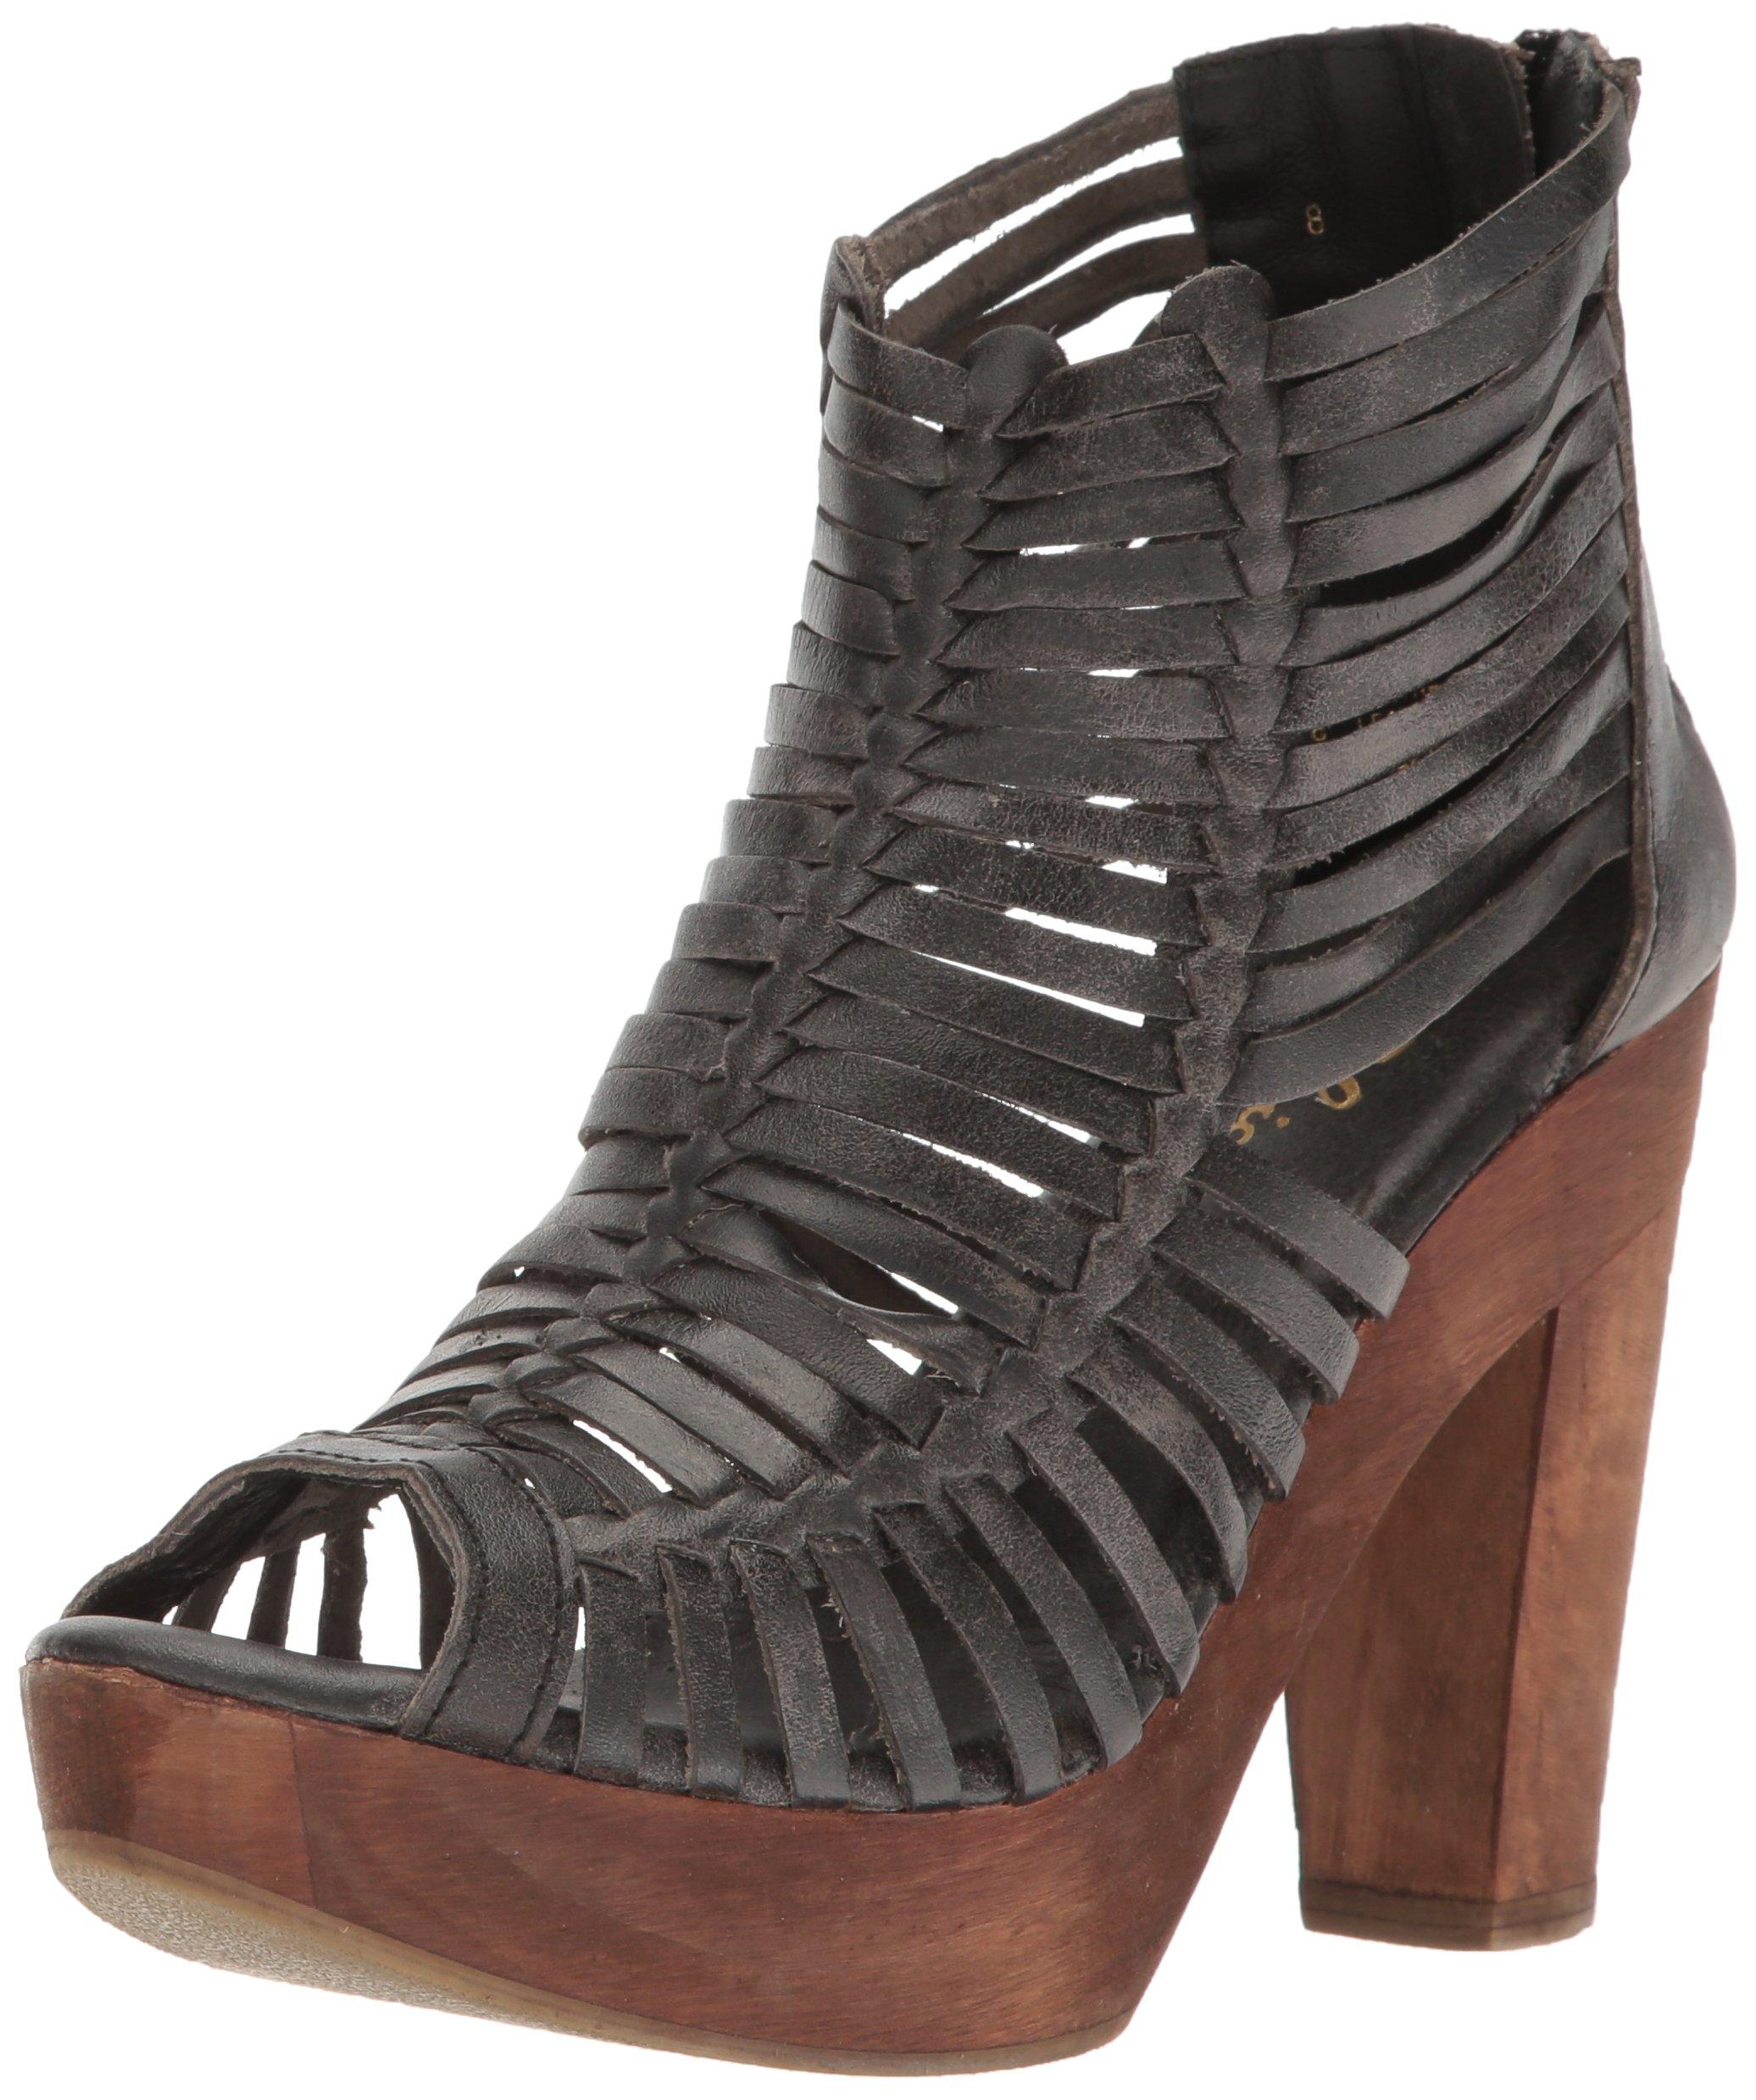 Sbicca Women's Yani Huarache Sandal, Black, 8 B US